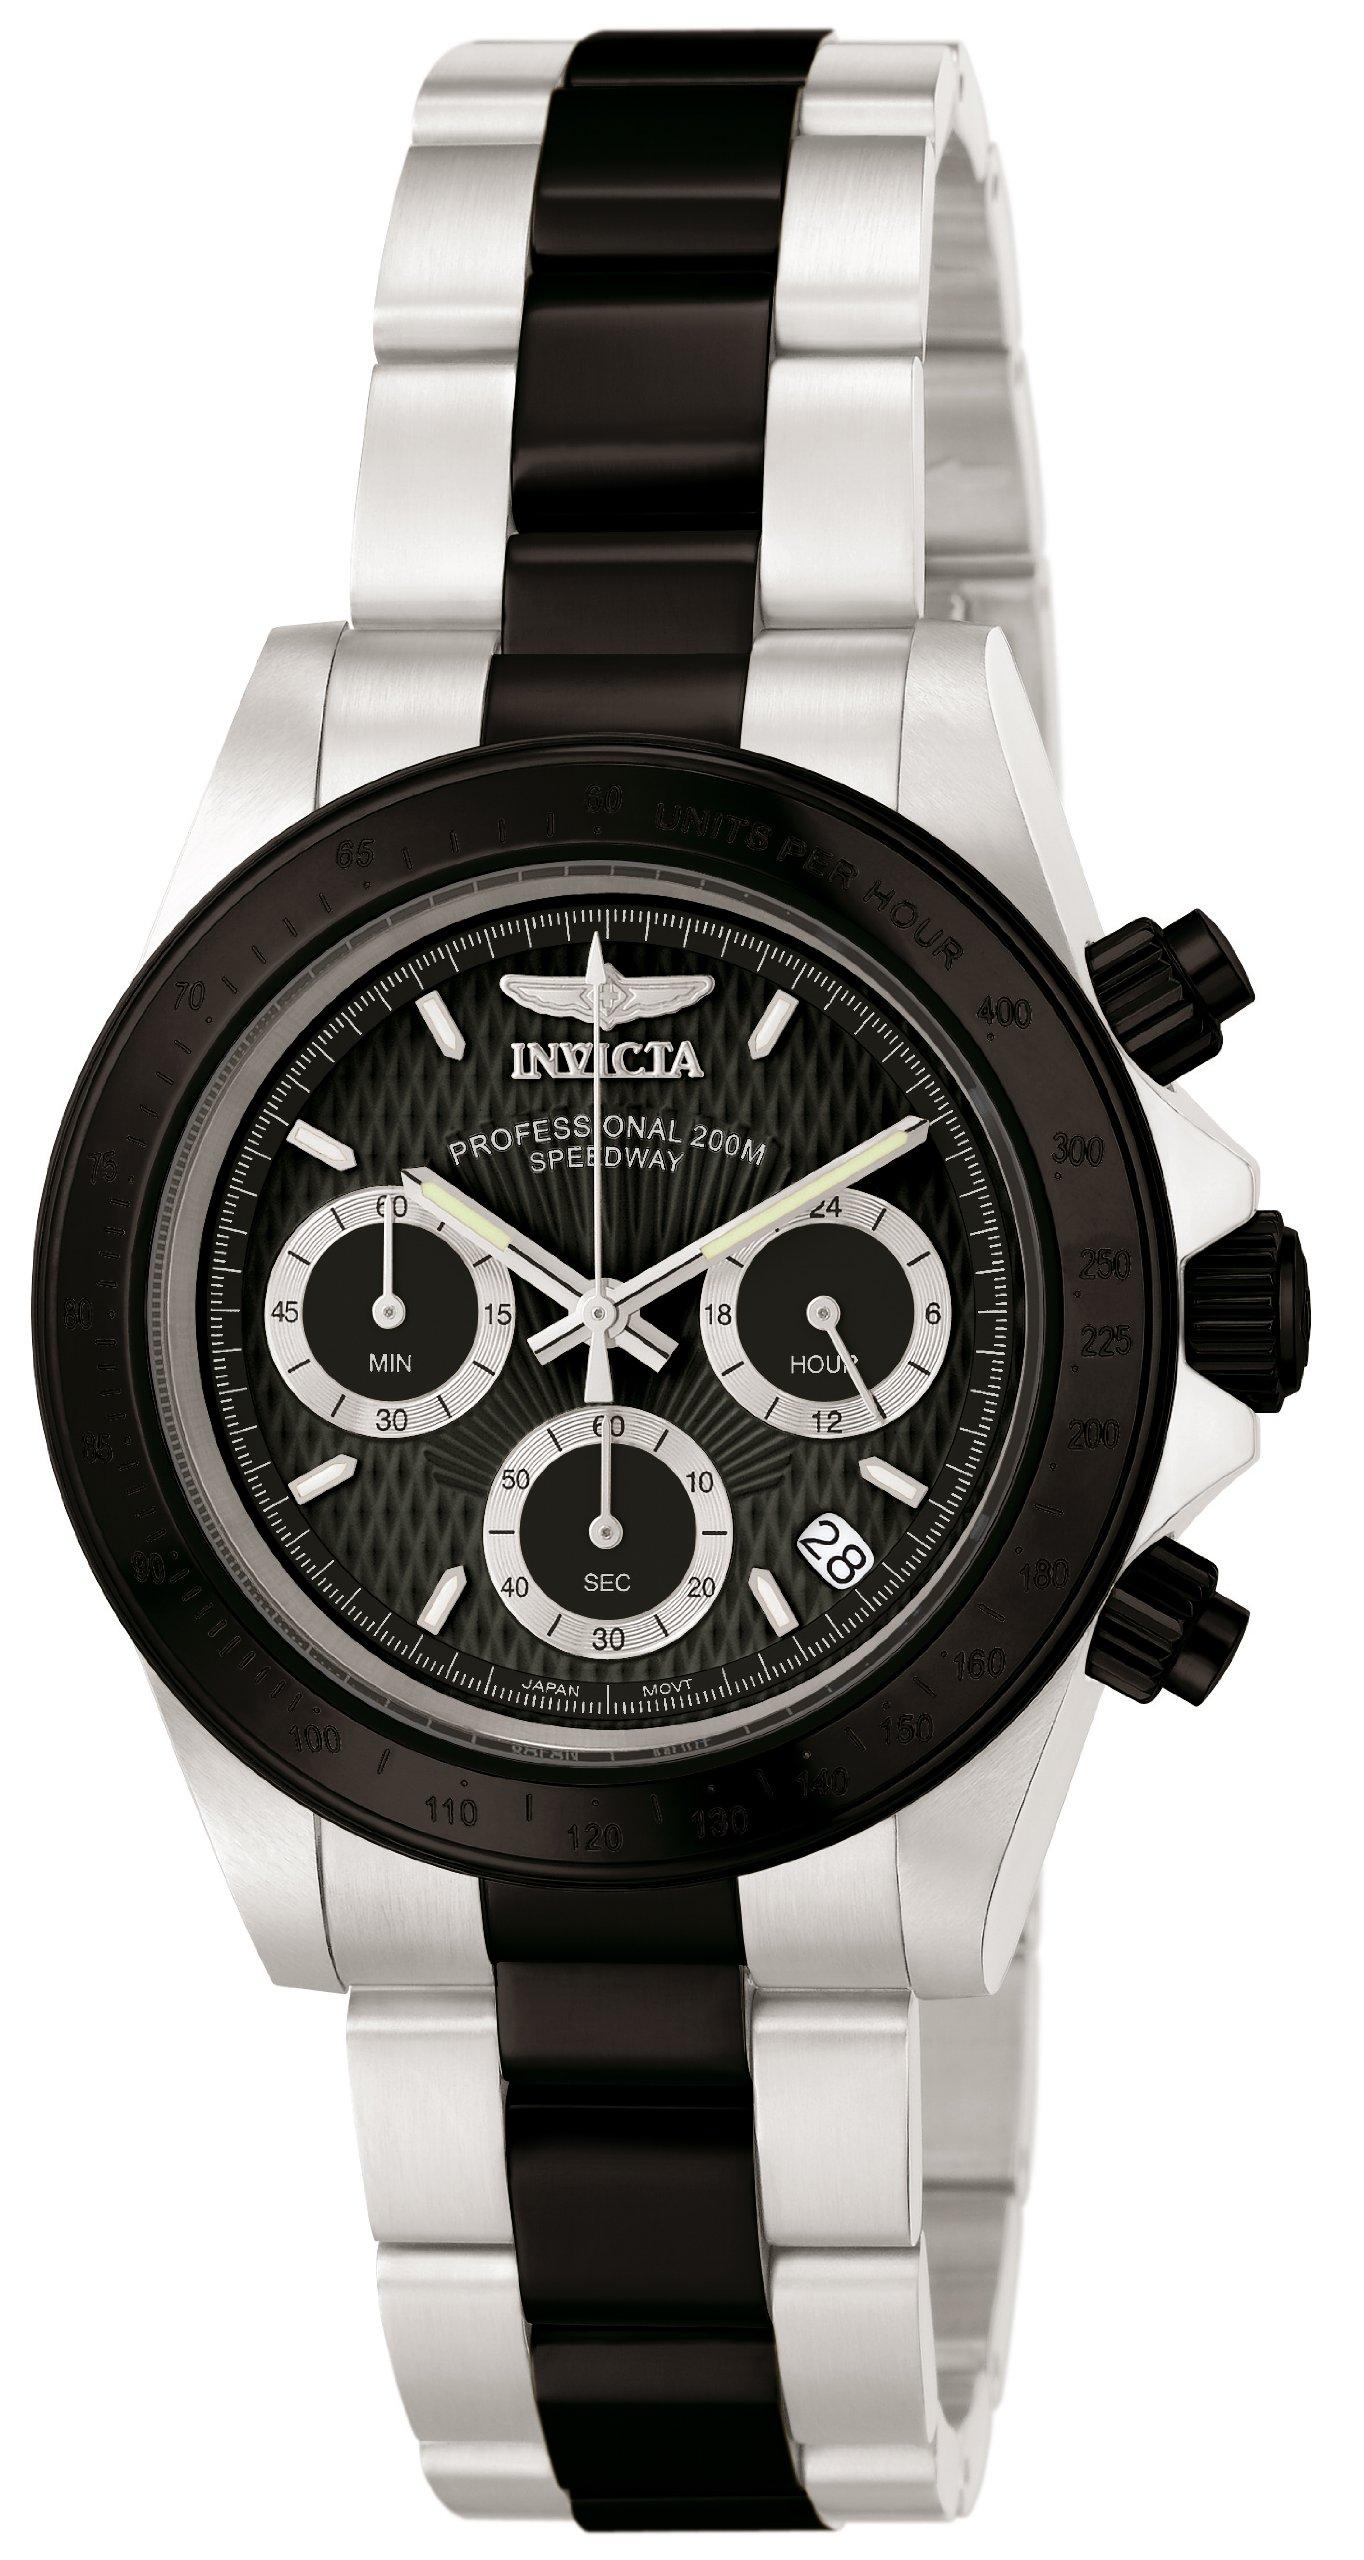 ویکالا · خرید  اصل اورجینال · خرید از آمازون · Invicta Men's 'Speedway' Quartz Stainless Steel Sport Watch, Color:Silver-Toned (Model: 6934) wekala · ویکالا